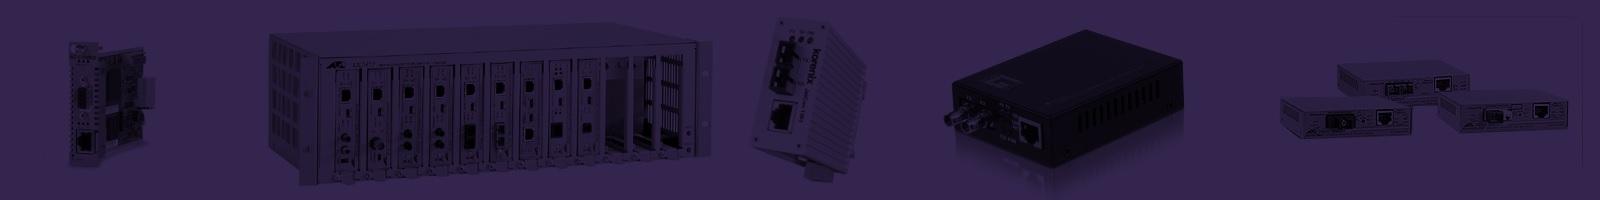 Allied Telesis MMC Mini Media and Rate Converters